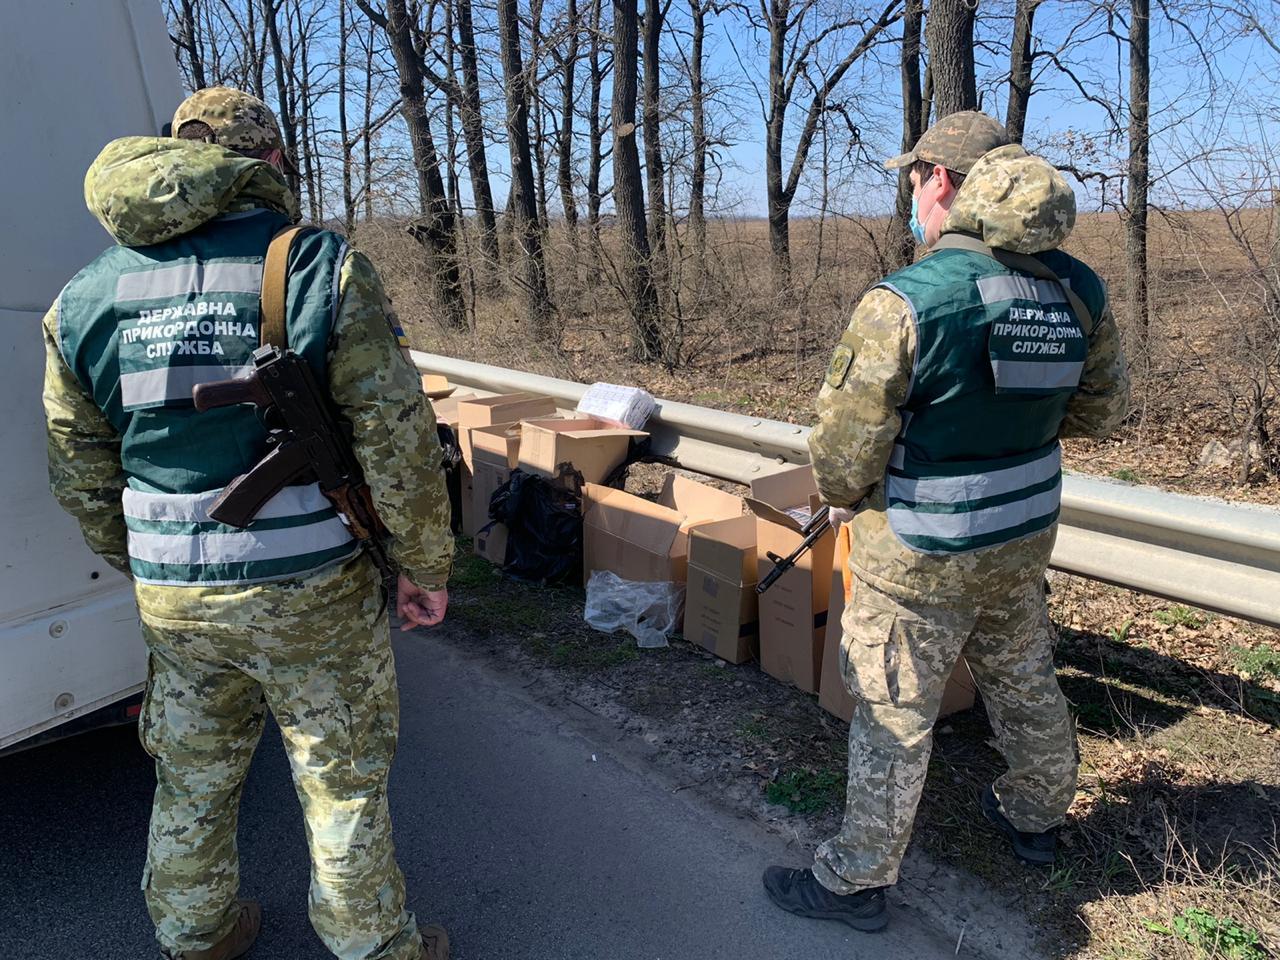 https://dpsu.gov.ua/upload/news/news_20200408_130954_1586340594.jpg